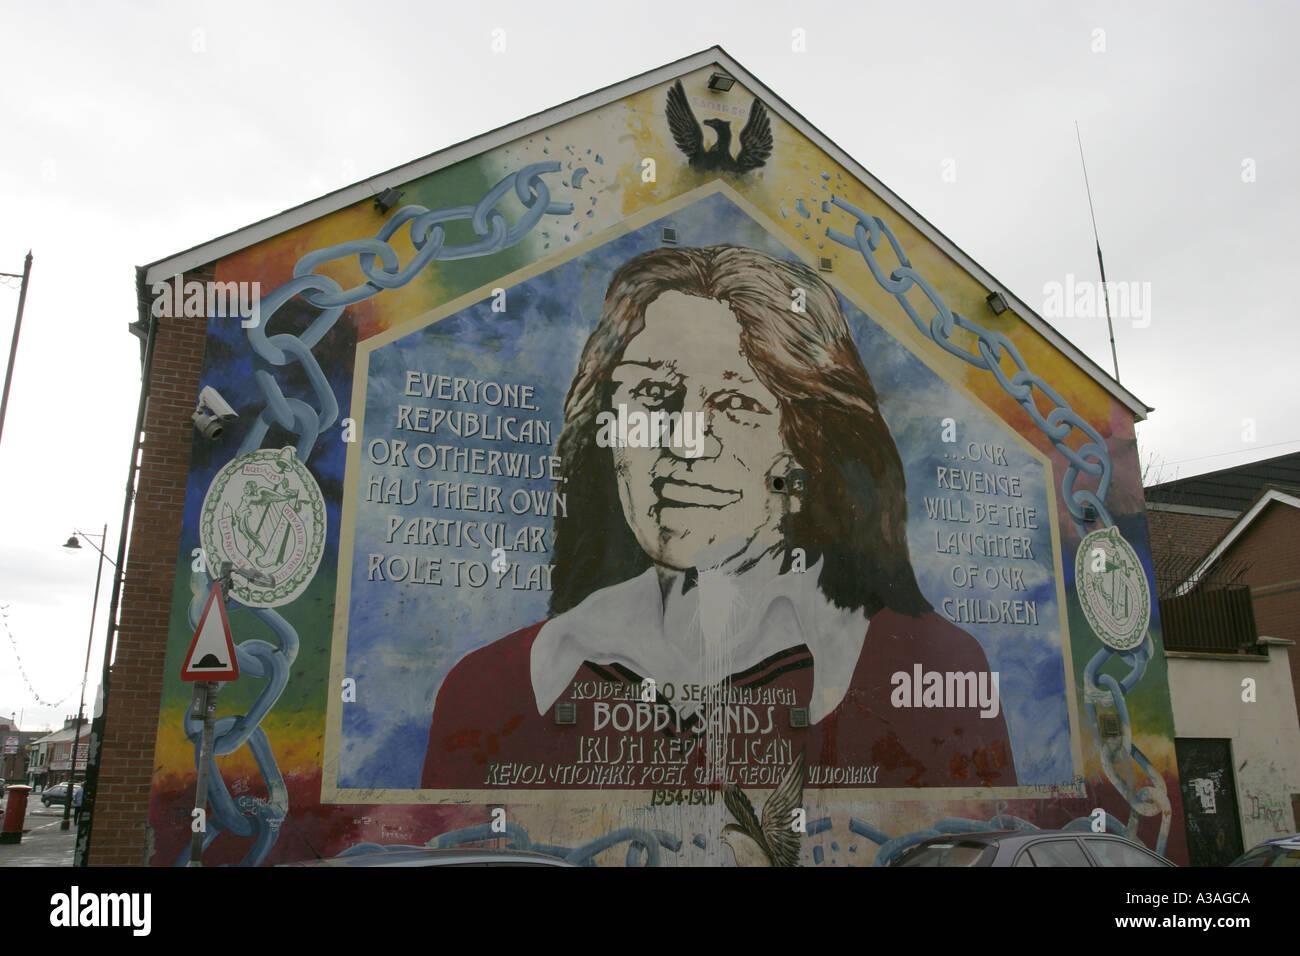 Bobby sands wall mural sevastopol street falls road sinn for Bobby sands mural falls road